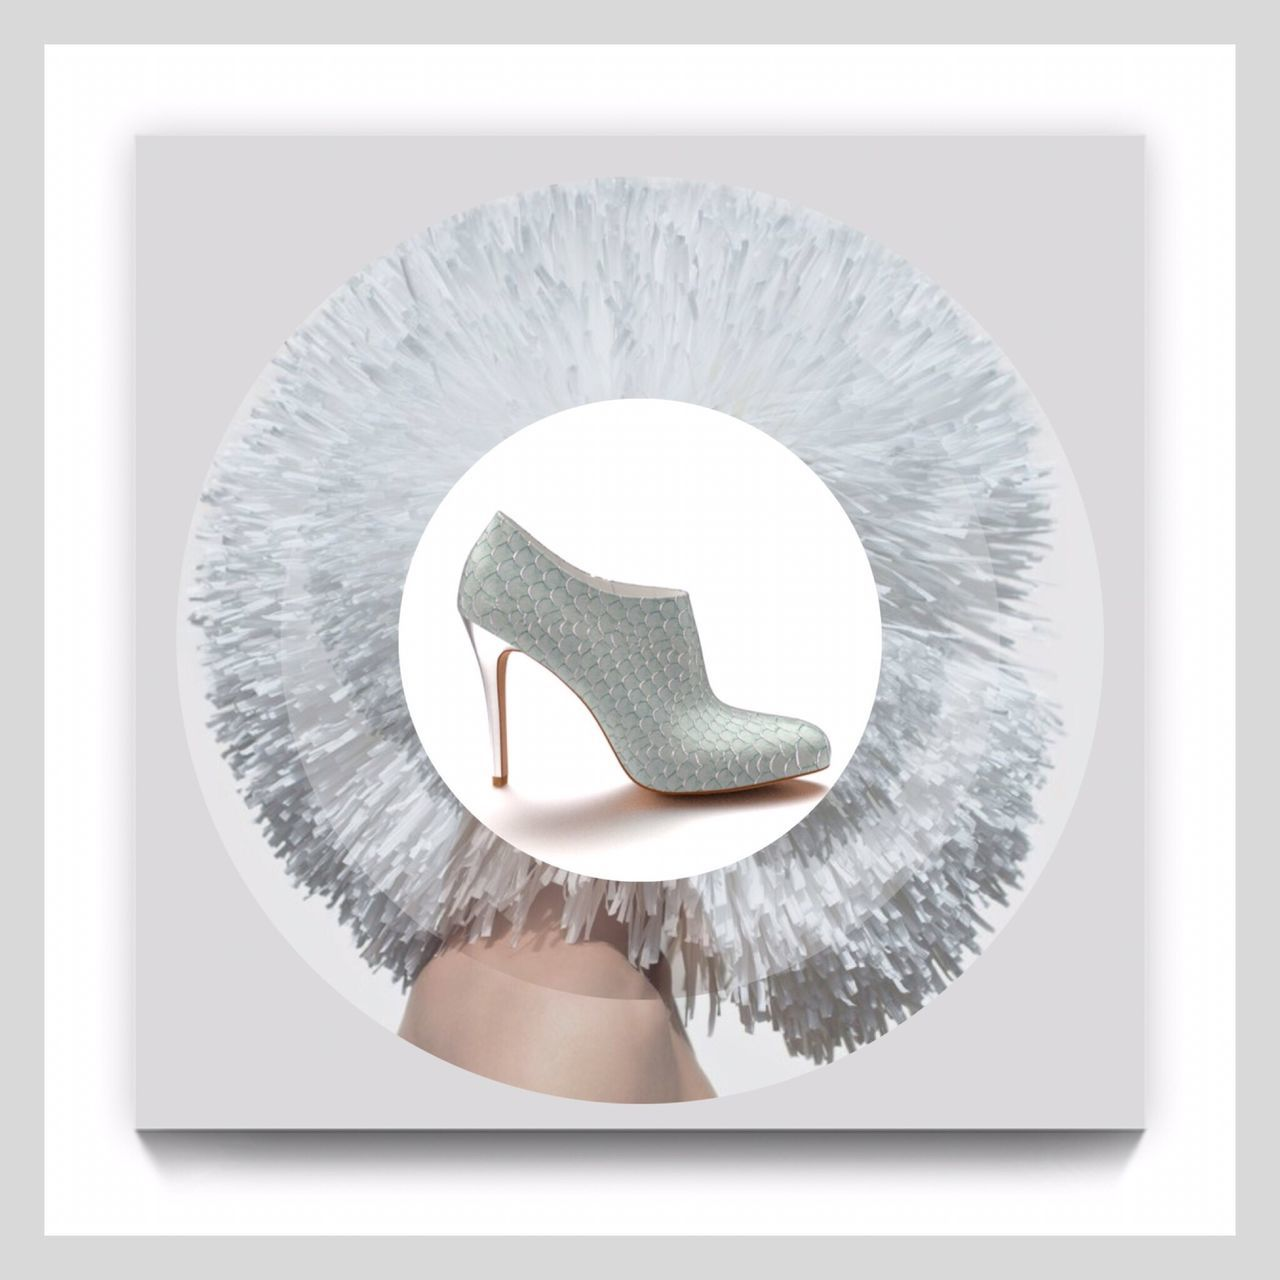 Fashion Photography Fashion Fashion Design Shoe Shoes Designer  Design Day Luxury Digital Composite